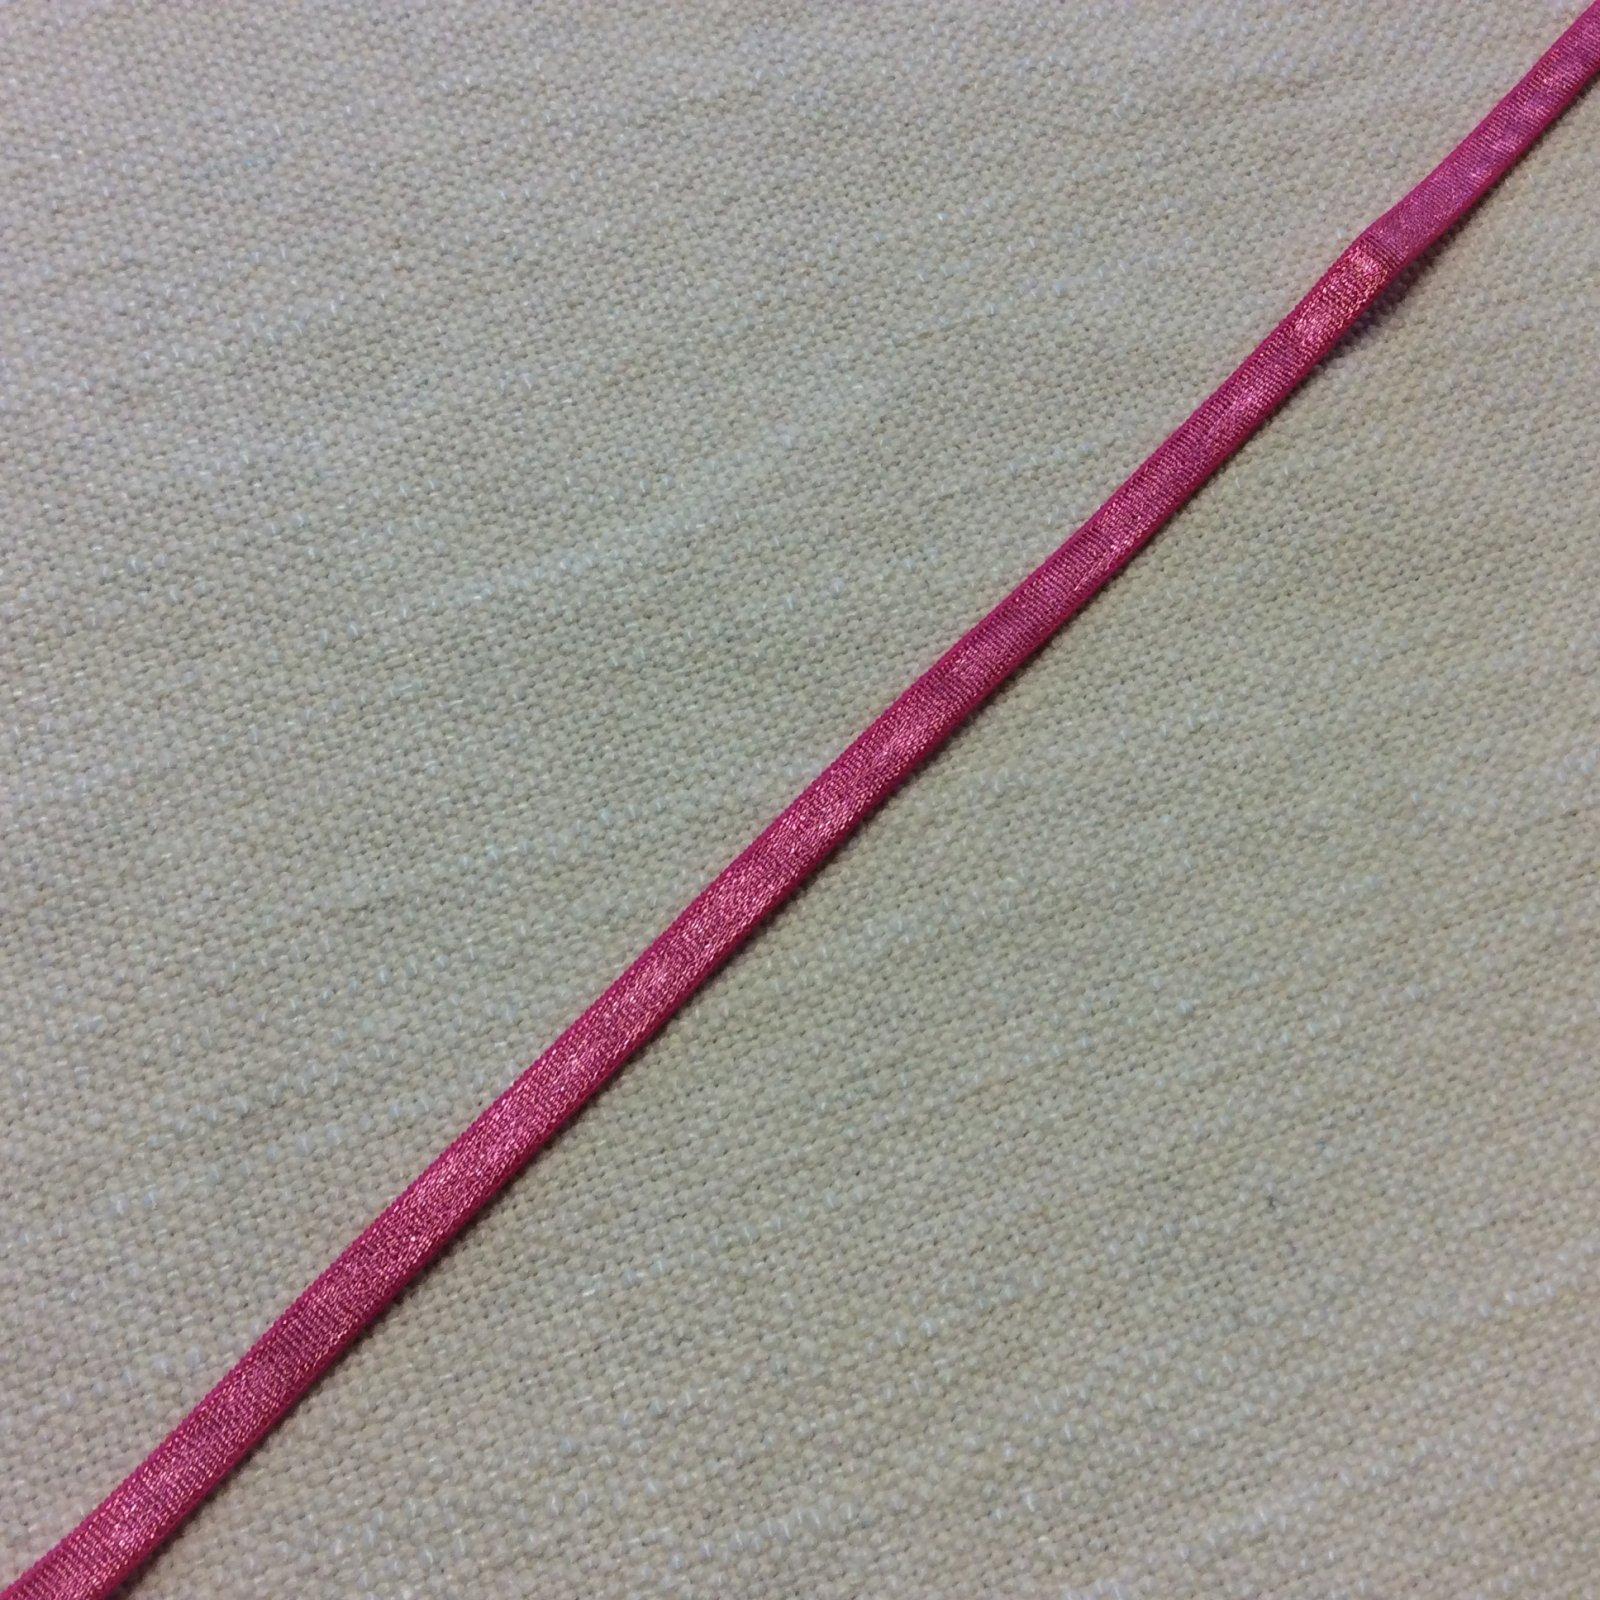 Made in France Flat Edge 3/8 Bright Pink Lingerie Elastic ELA009